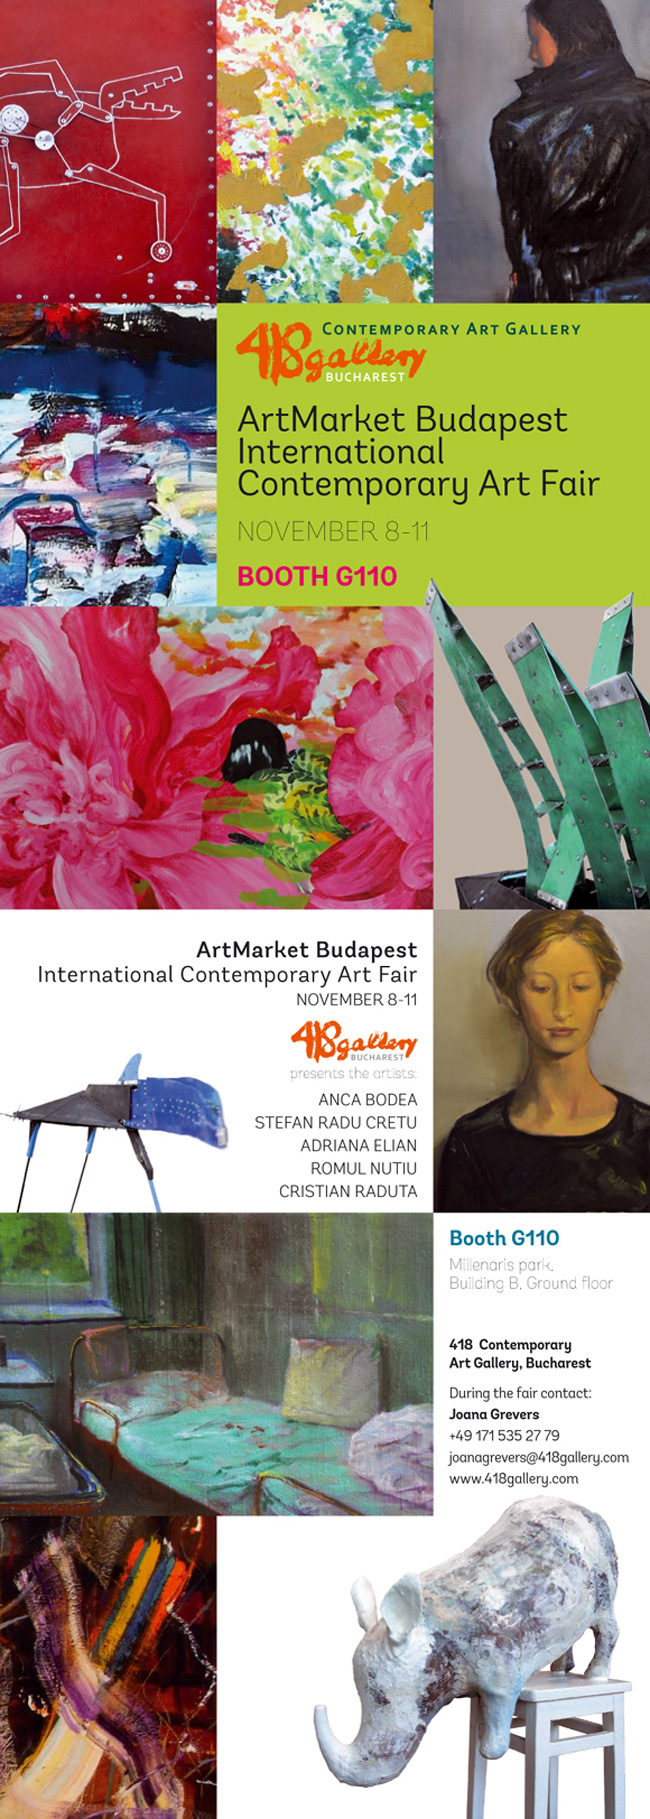 418 Contemporary Art Gallery la Art Market Budapest 2012